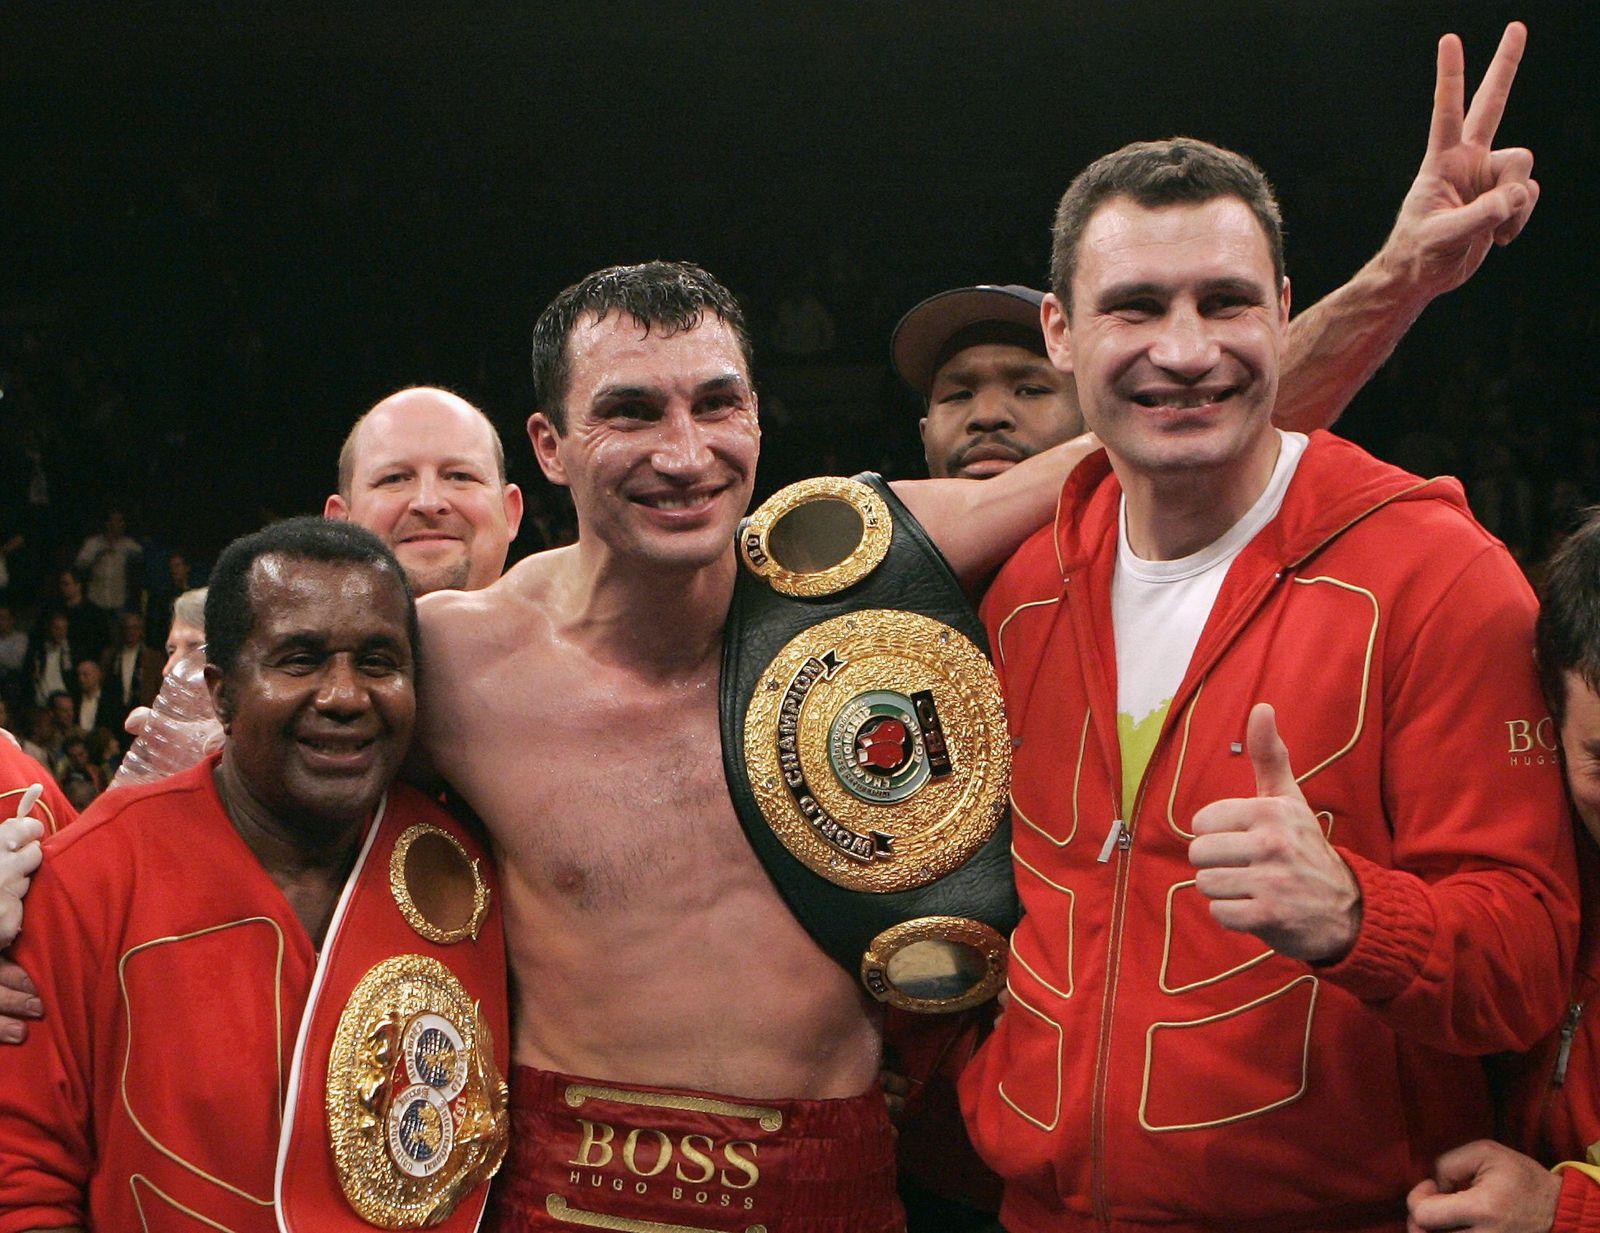 Wladimir Klitschko of Ukraine celebrates win over Calvin Brock of US in heavyweight championship in New York